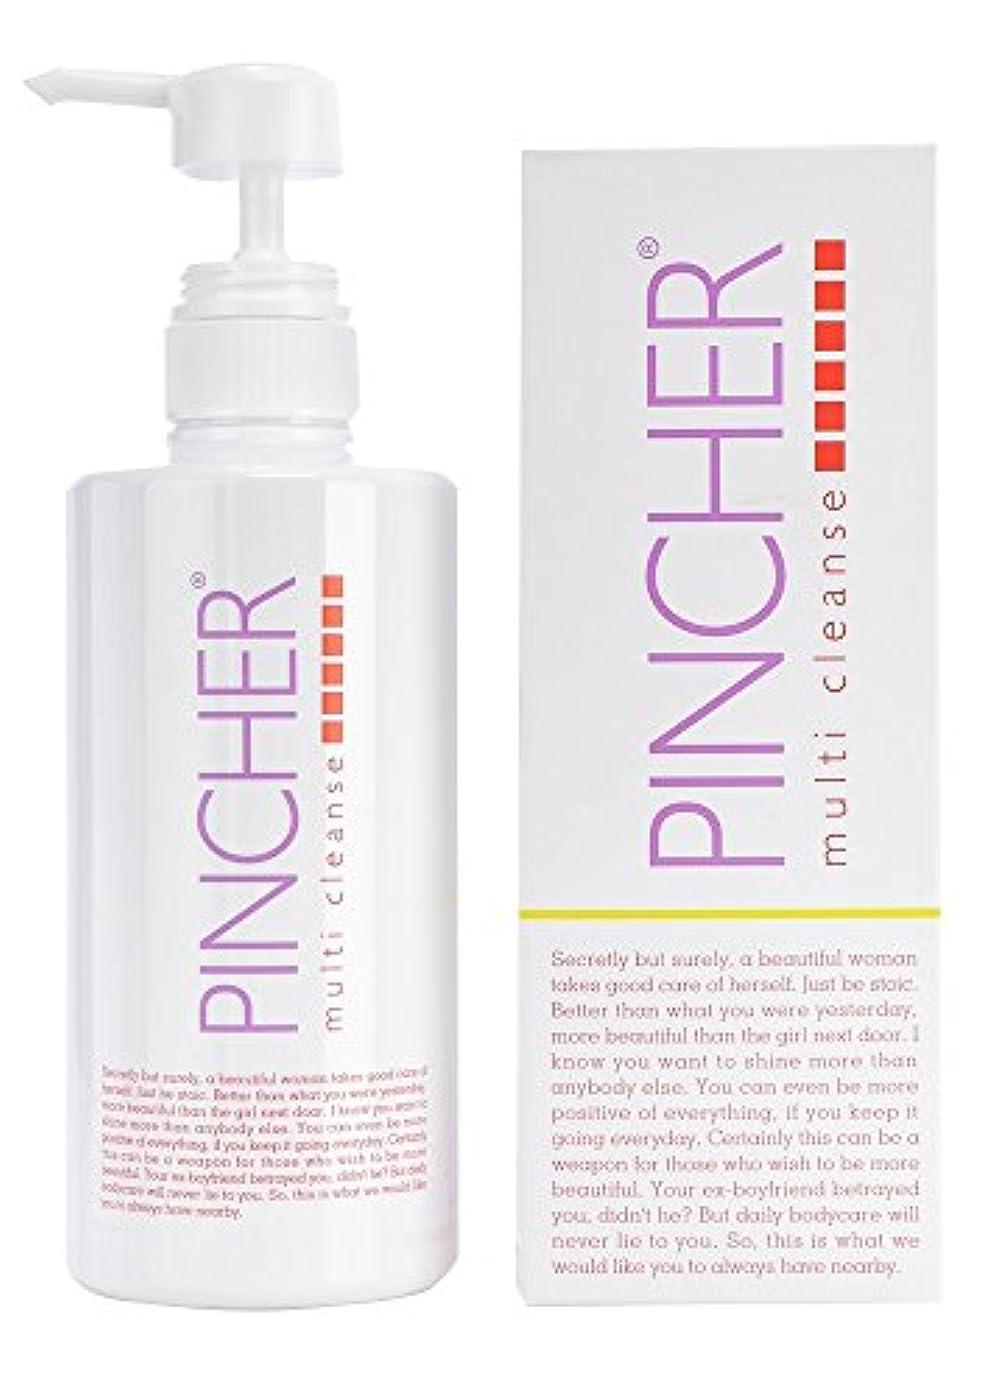 PINCHER mulch cleanse 500ml ピンシャーマルチクレンズ